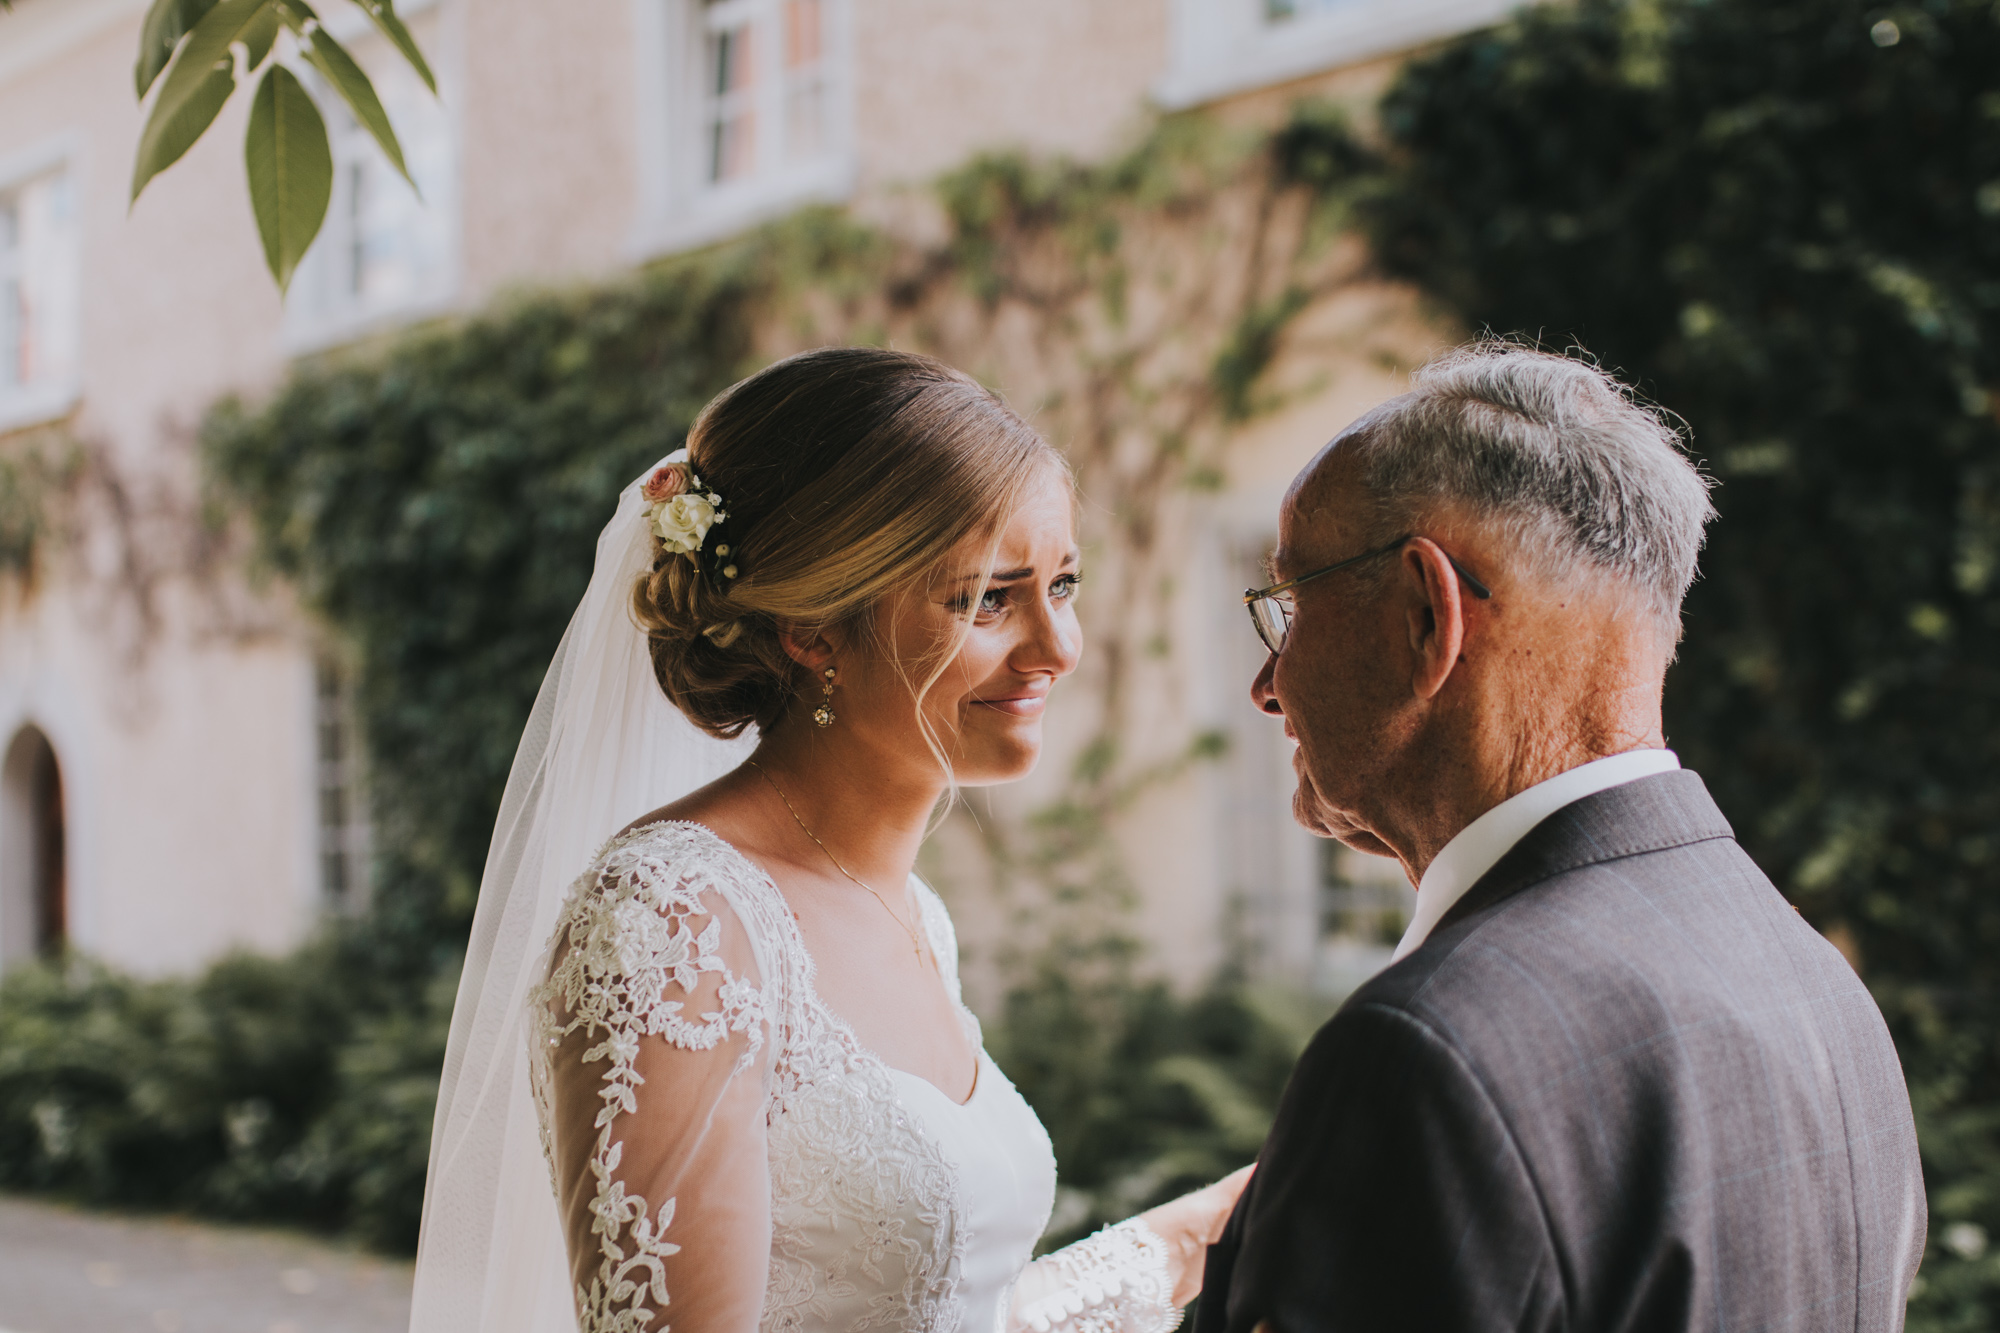 Hochzeit - Memory factory - 20180616-0037.jpg